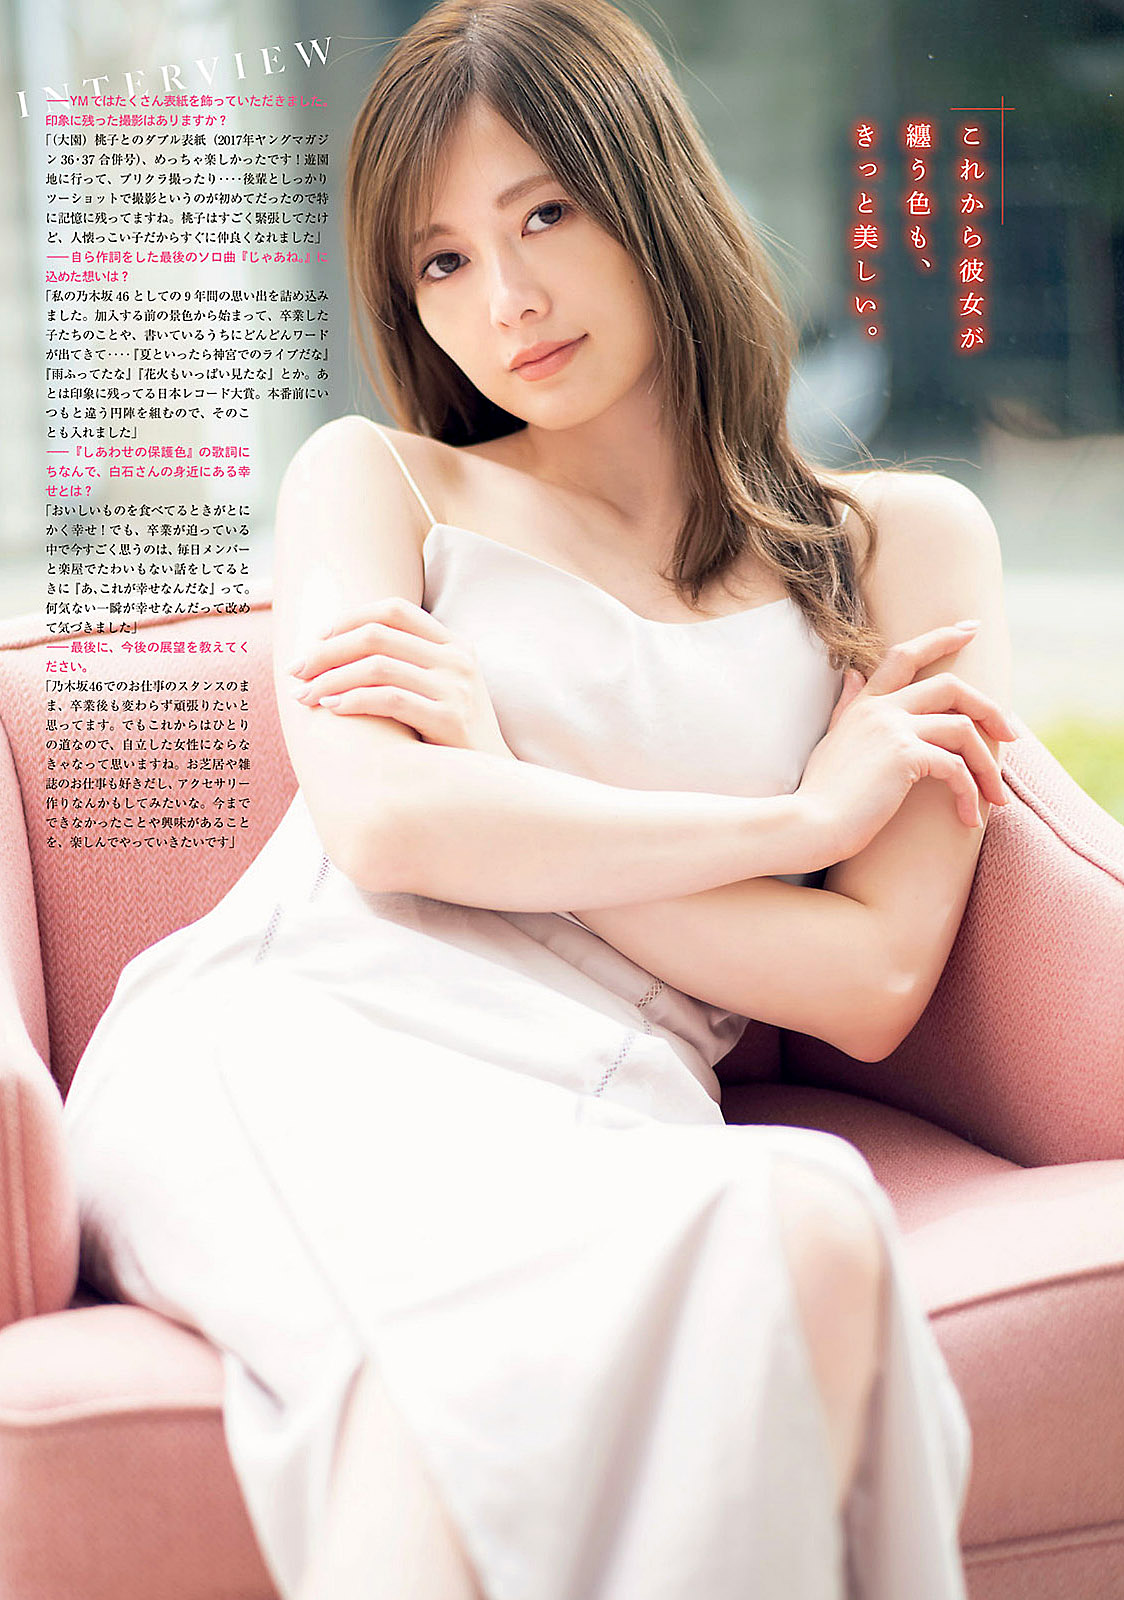 MShiraishi Young Magazine 200504 08.jpg